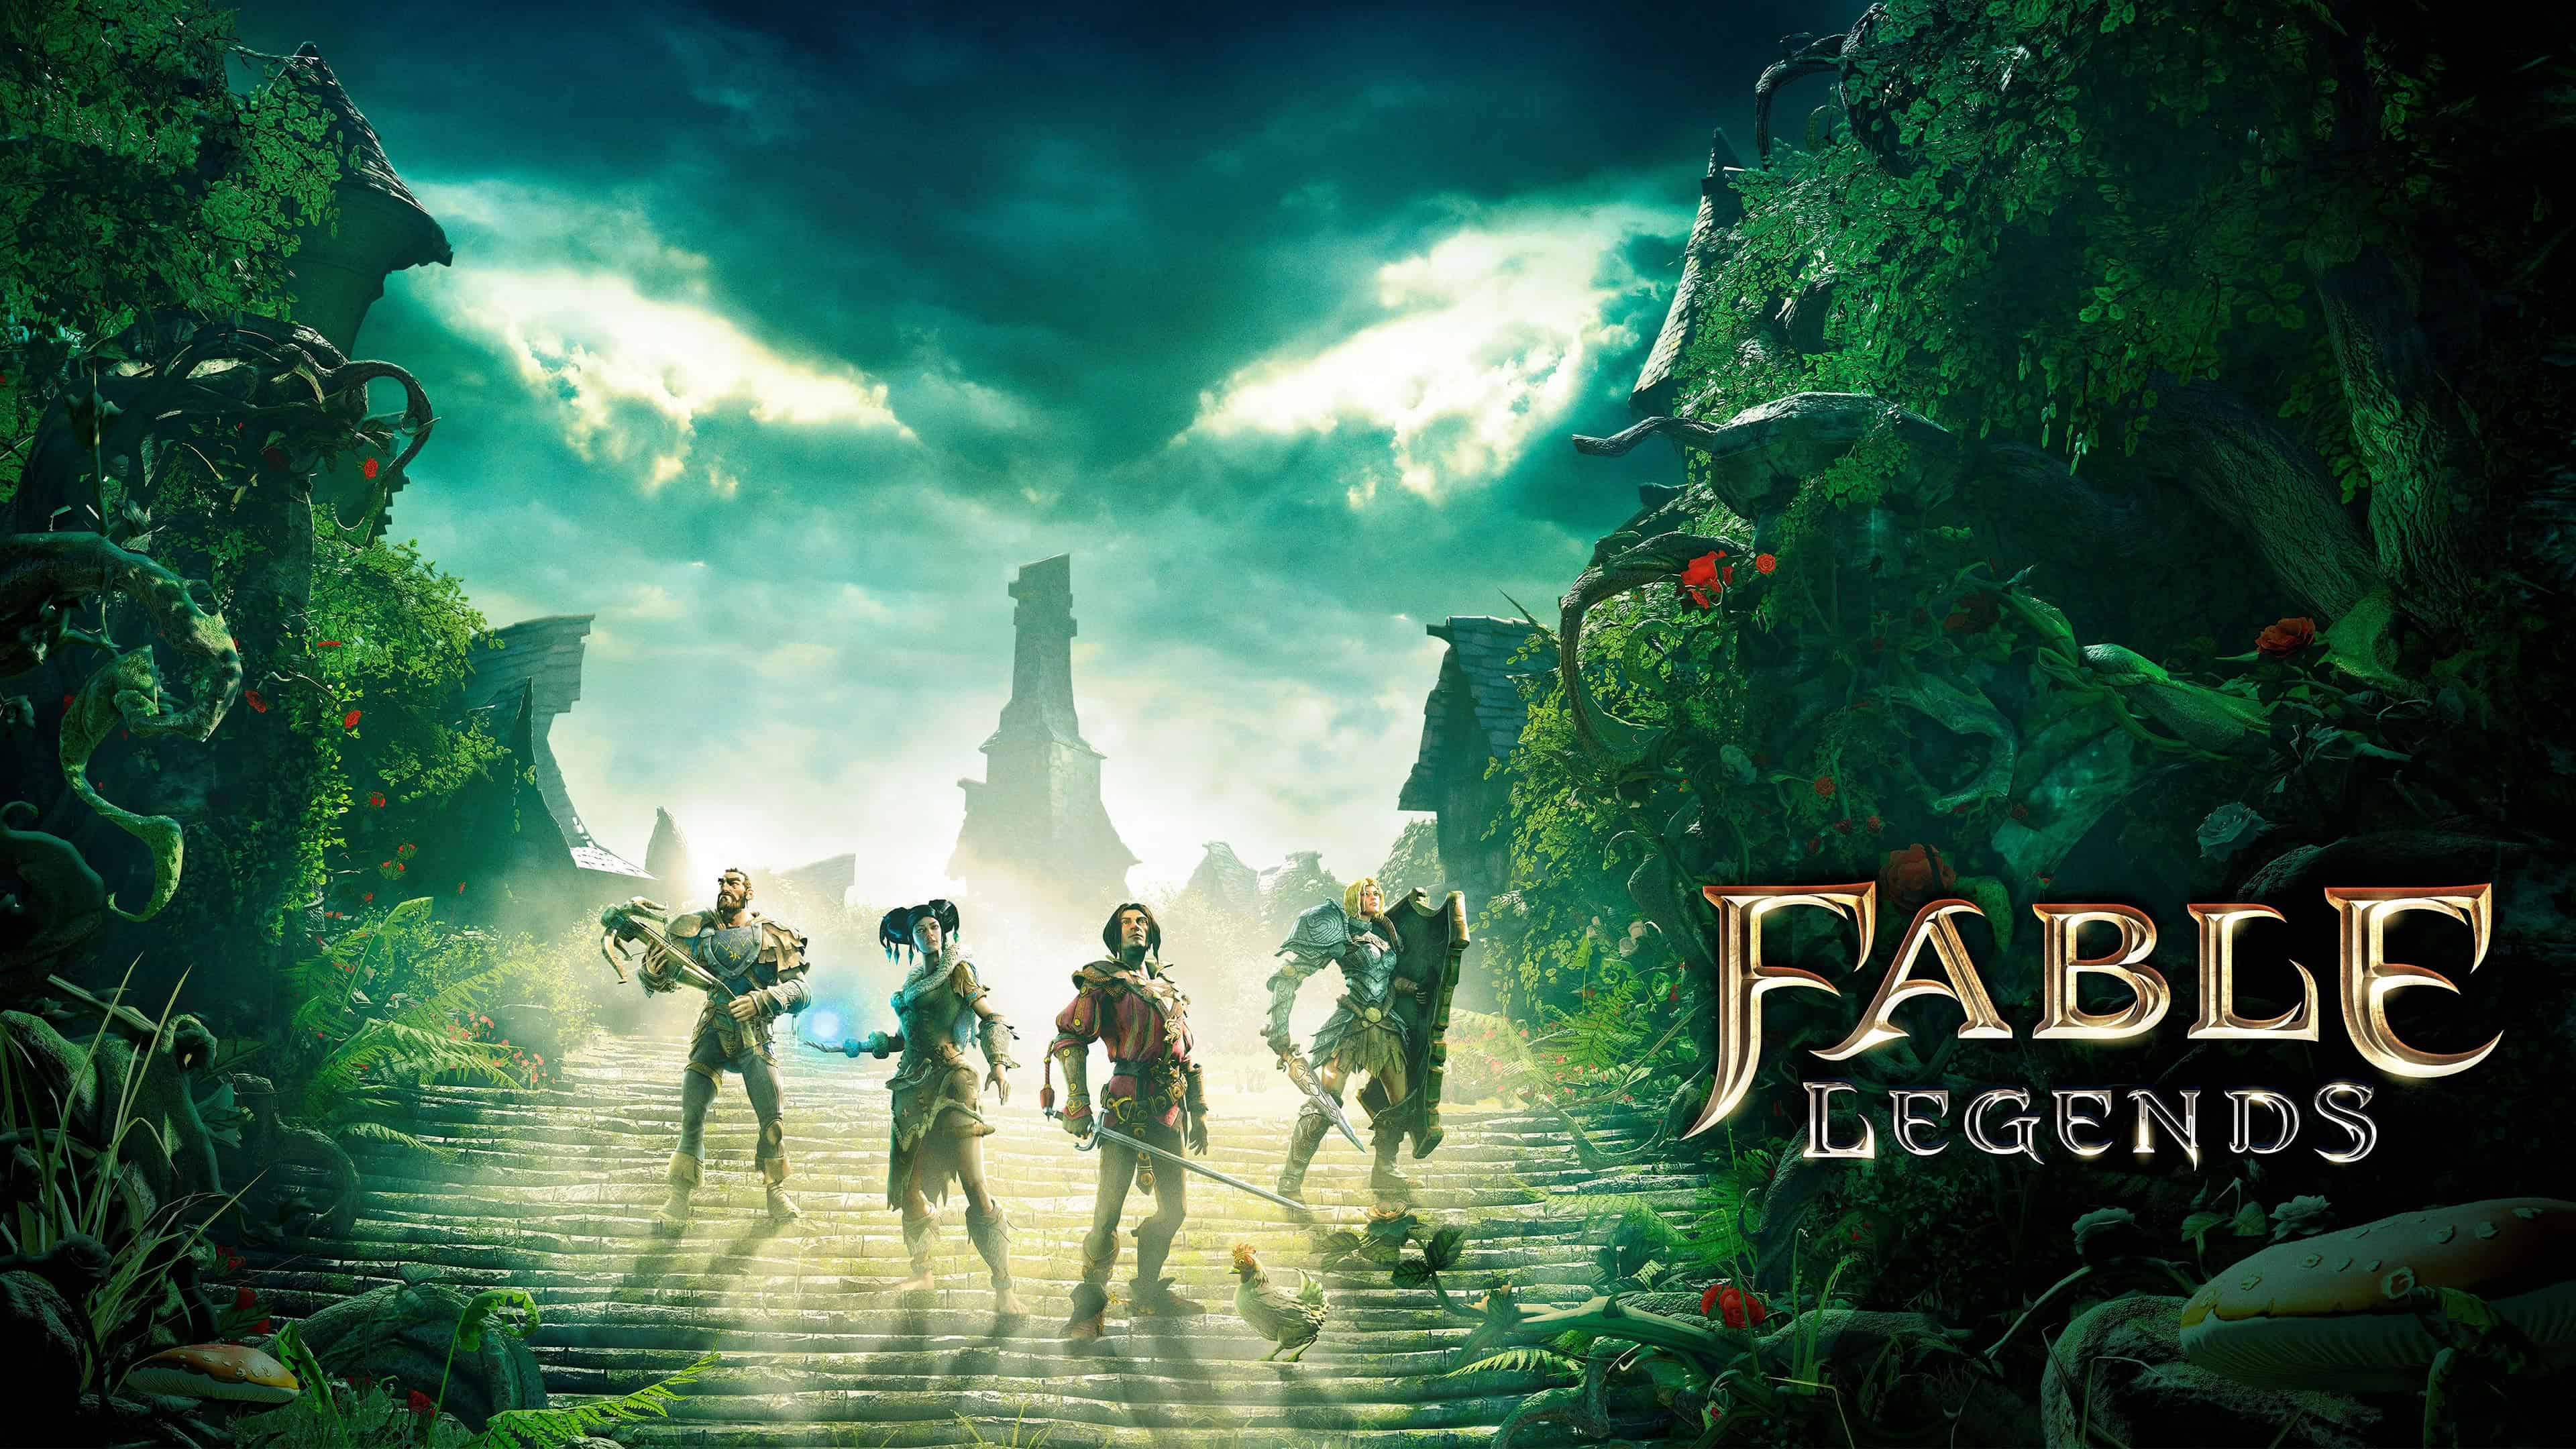 fable legends uhd 4k wallpaper.